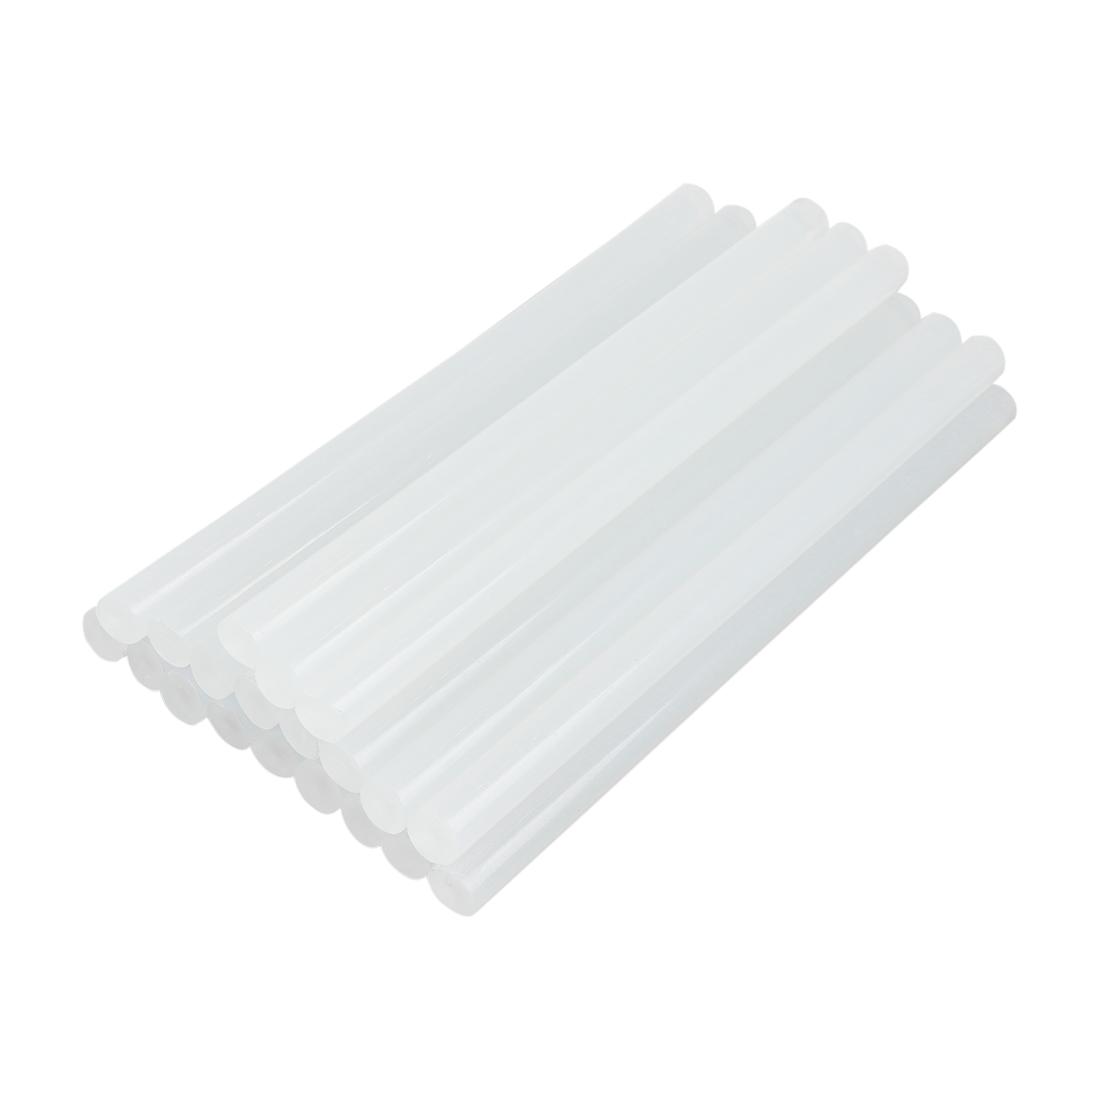 20 Pcs 11mm x 200mm Clear Paintless Dent Repair Hot Melt Glue Sticks for Car